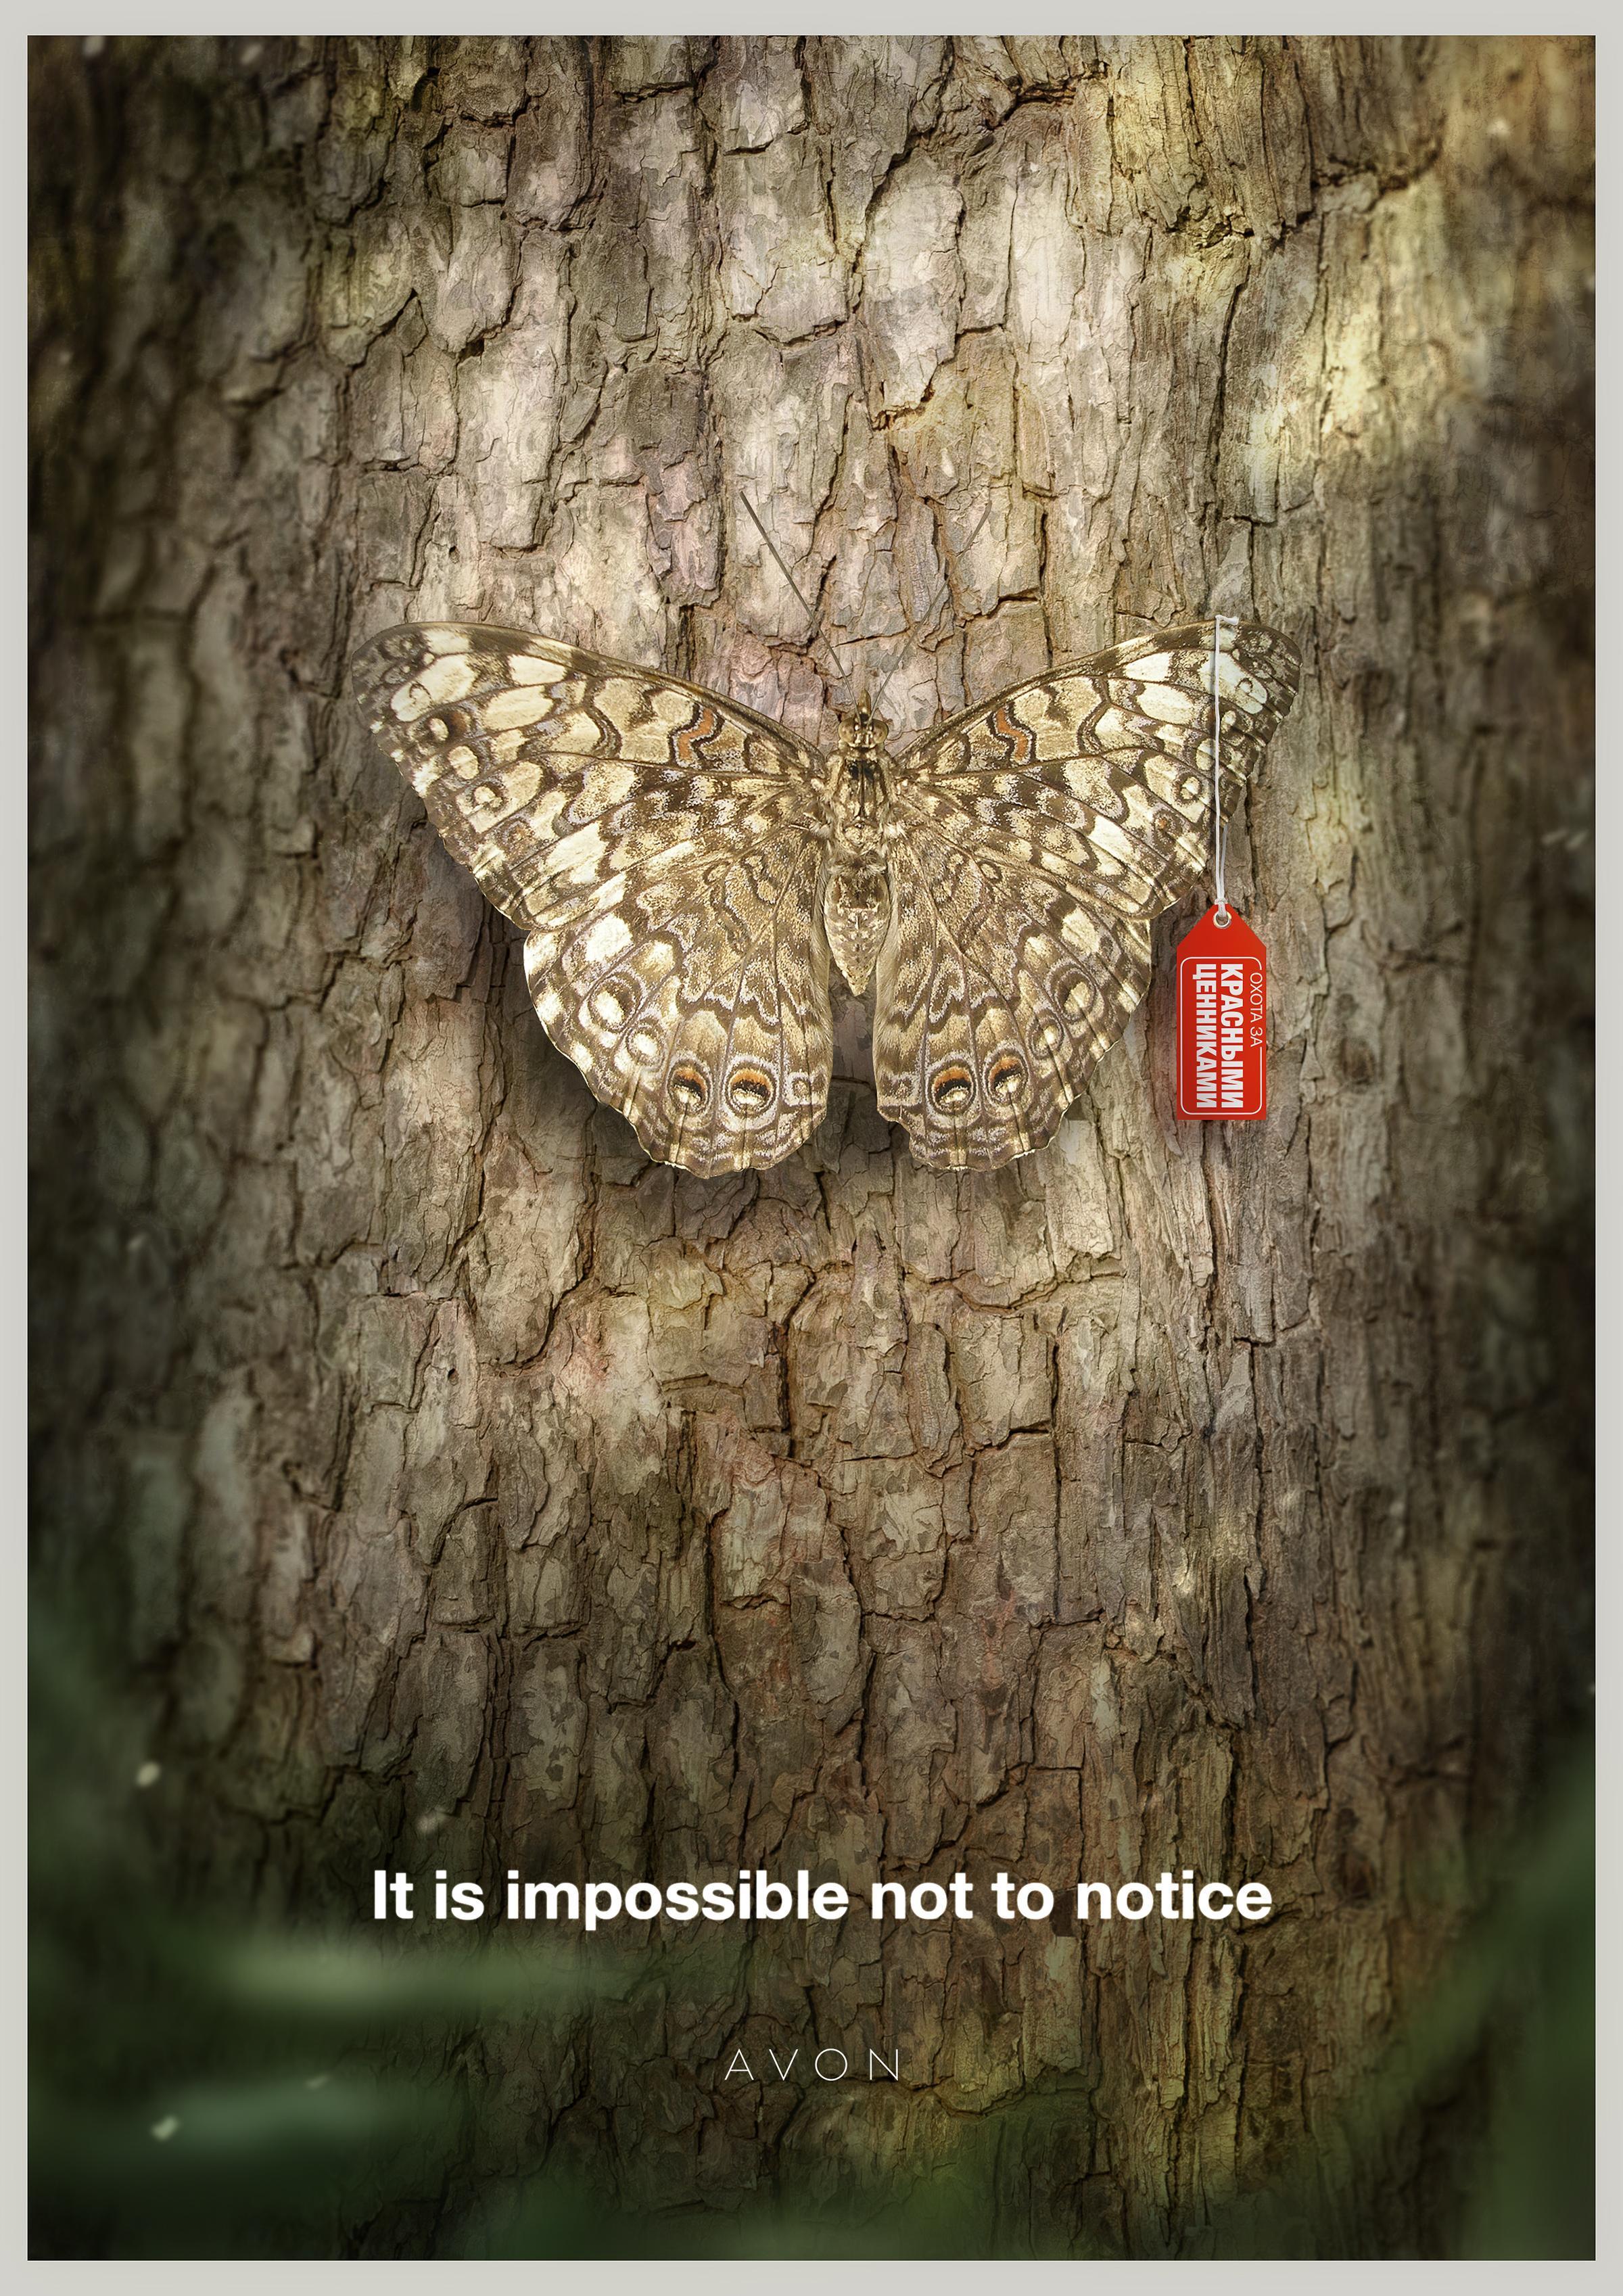 Avon Print Ad - Сamouflage, 1